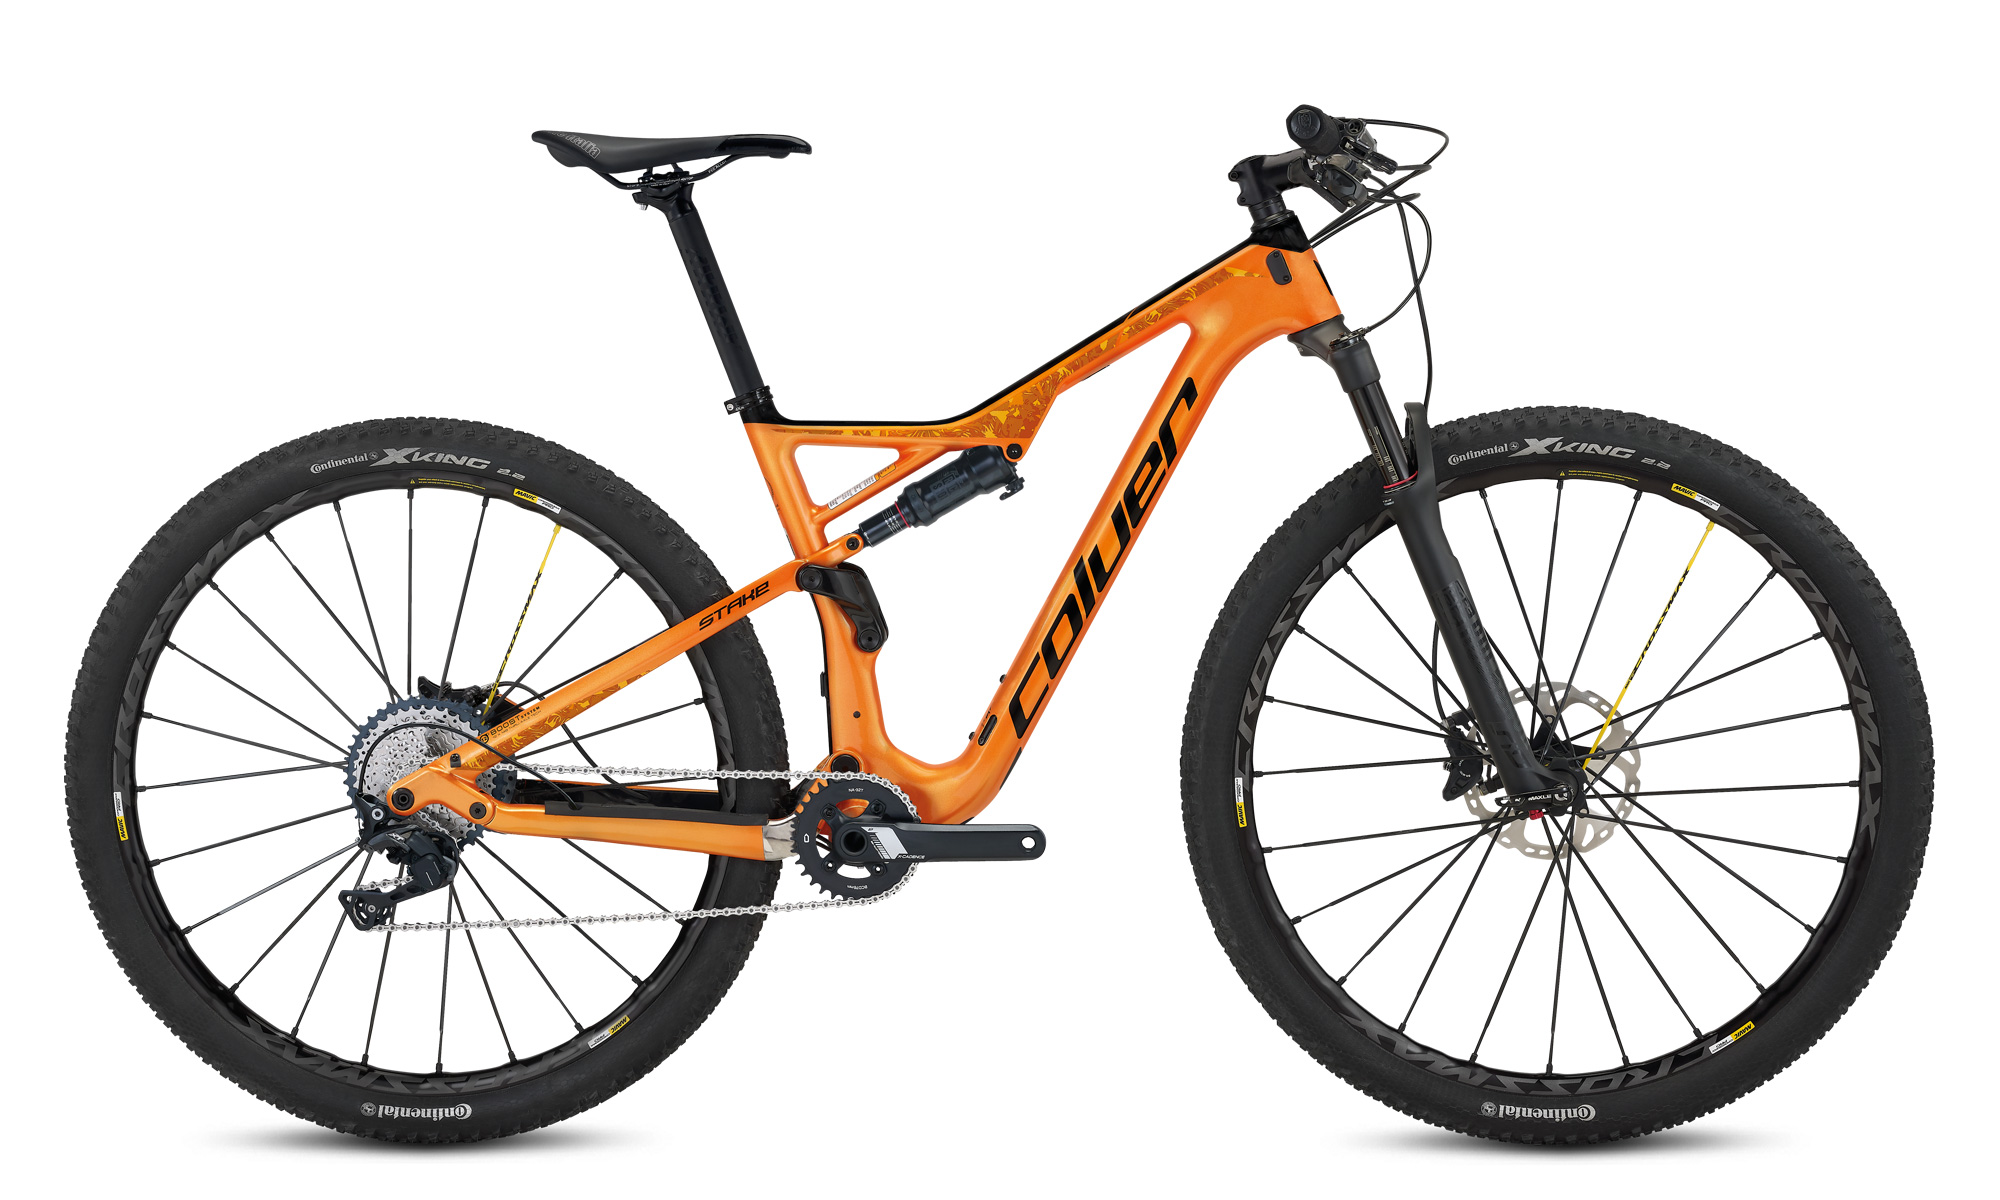 2019-Coluer-Stake_CR_81-orange_black.jpg